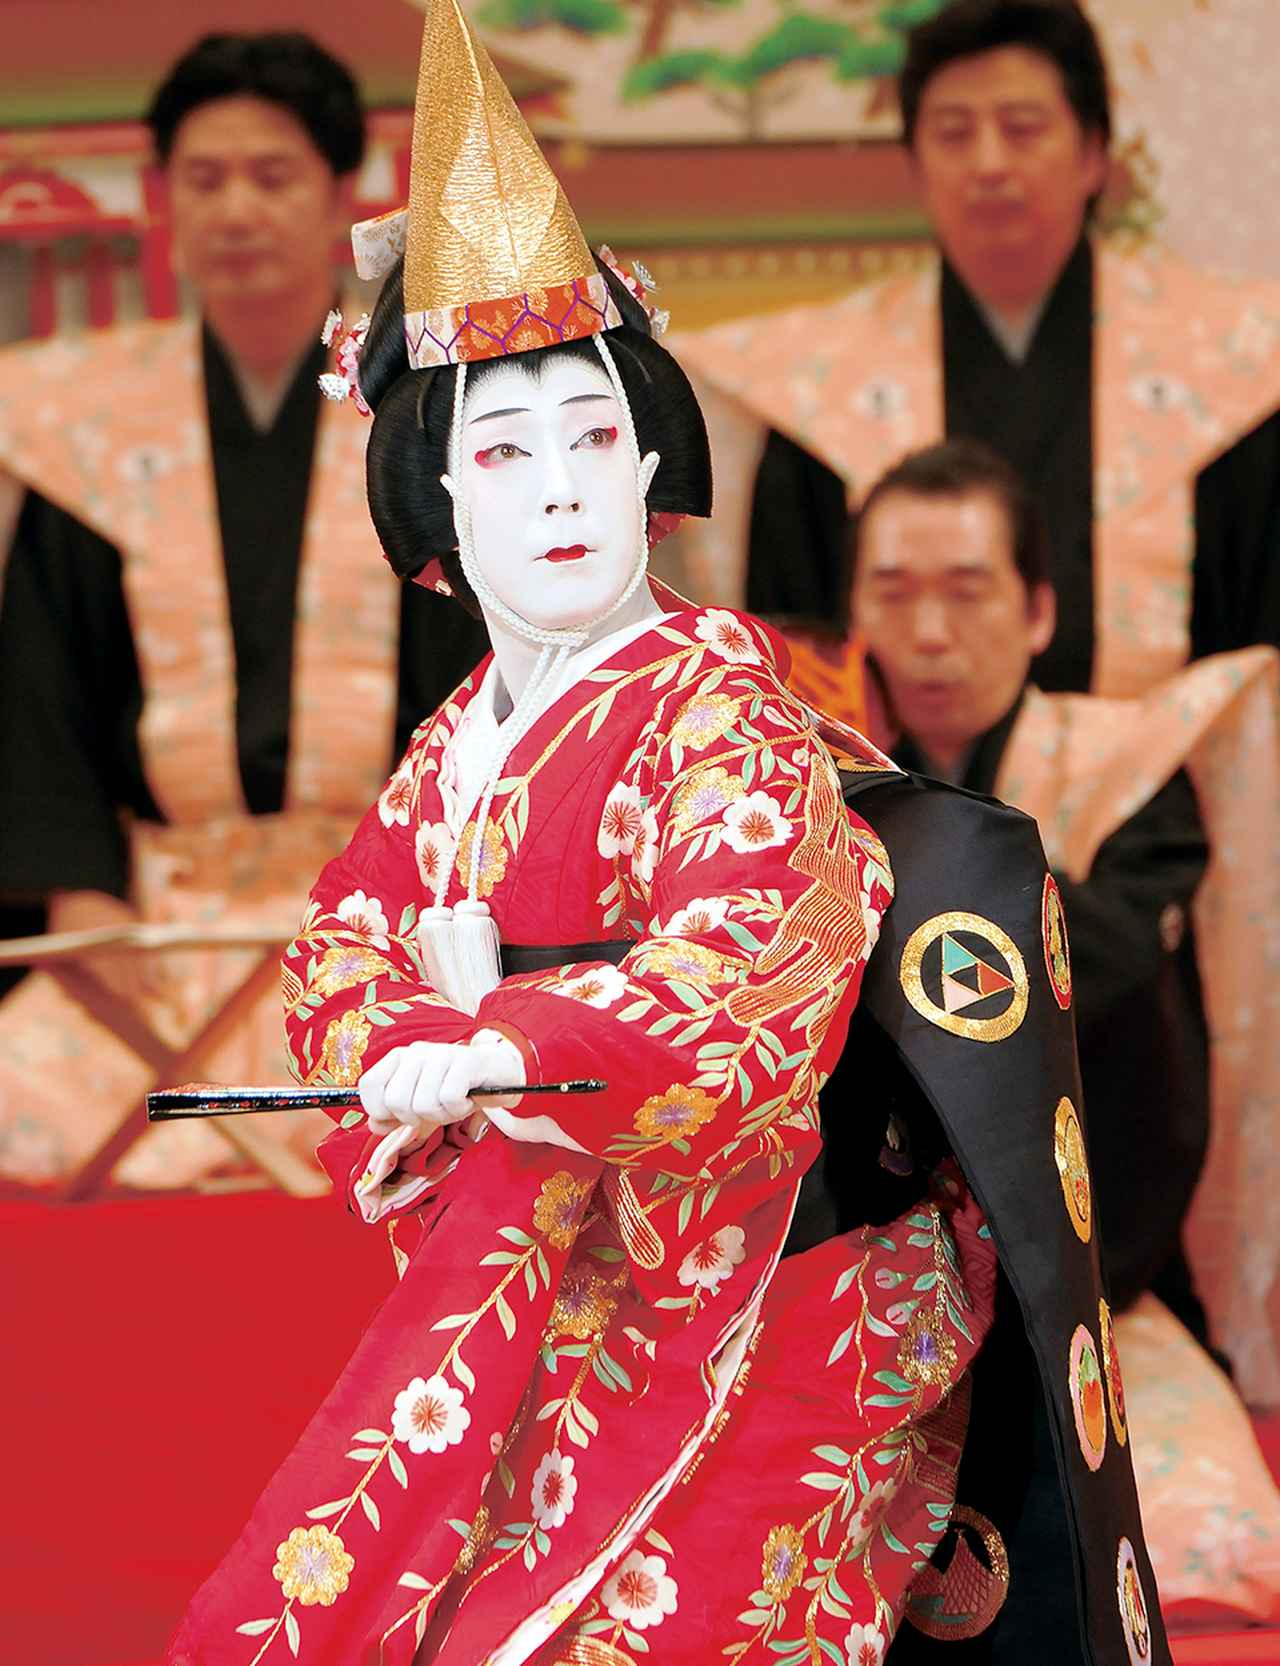 Images : 1番目の画像 - 「「歌舞伎への扉」 Vol.3 舞踊であり、芝居である。 ――尾上菊之助が語る 歌舞伎の華『京鹿子娘道成寺』」のアルバム - T JAPAN:The New York Times Style Magazine 公式サイト